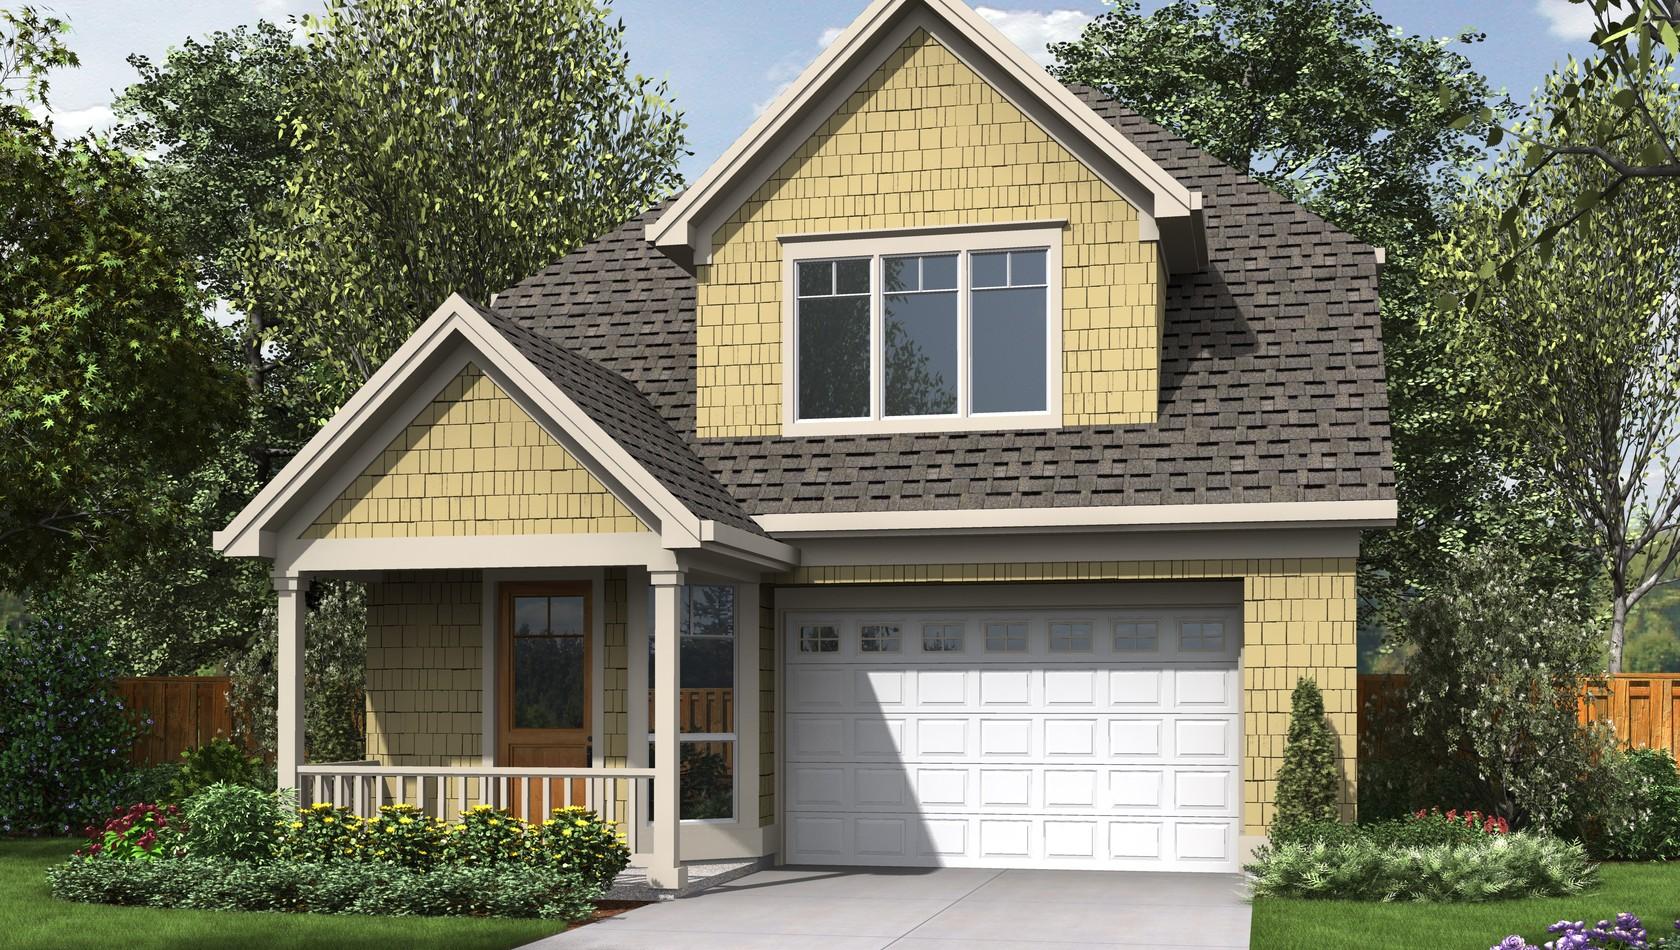 Main image for house plan 21130: The Shaftbury